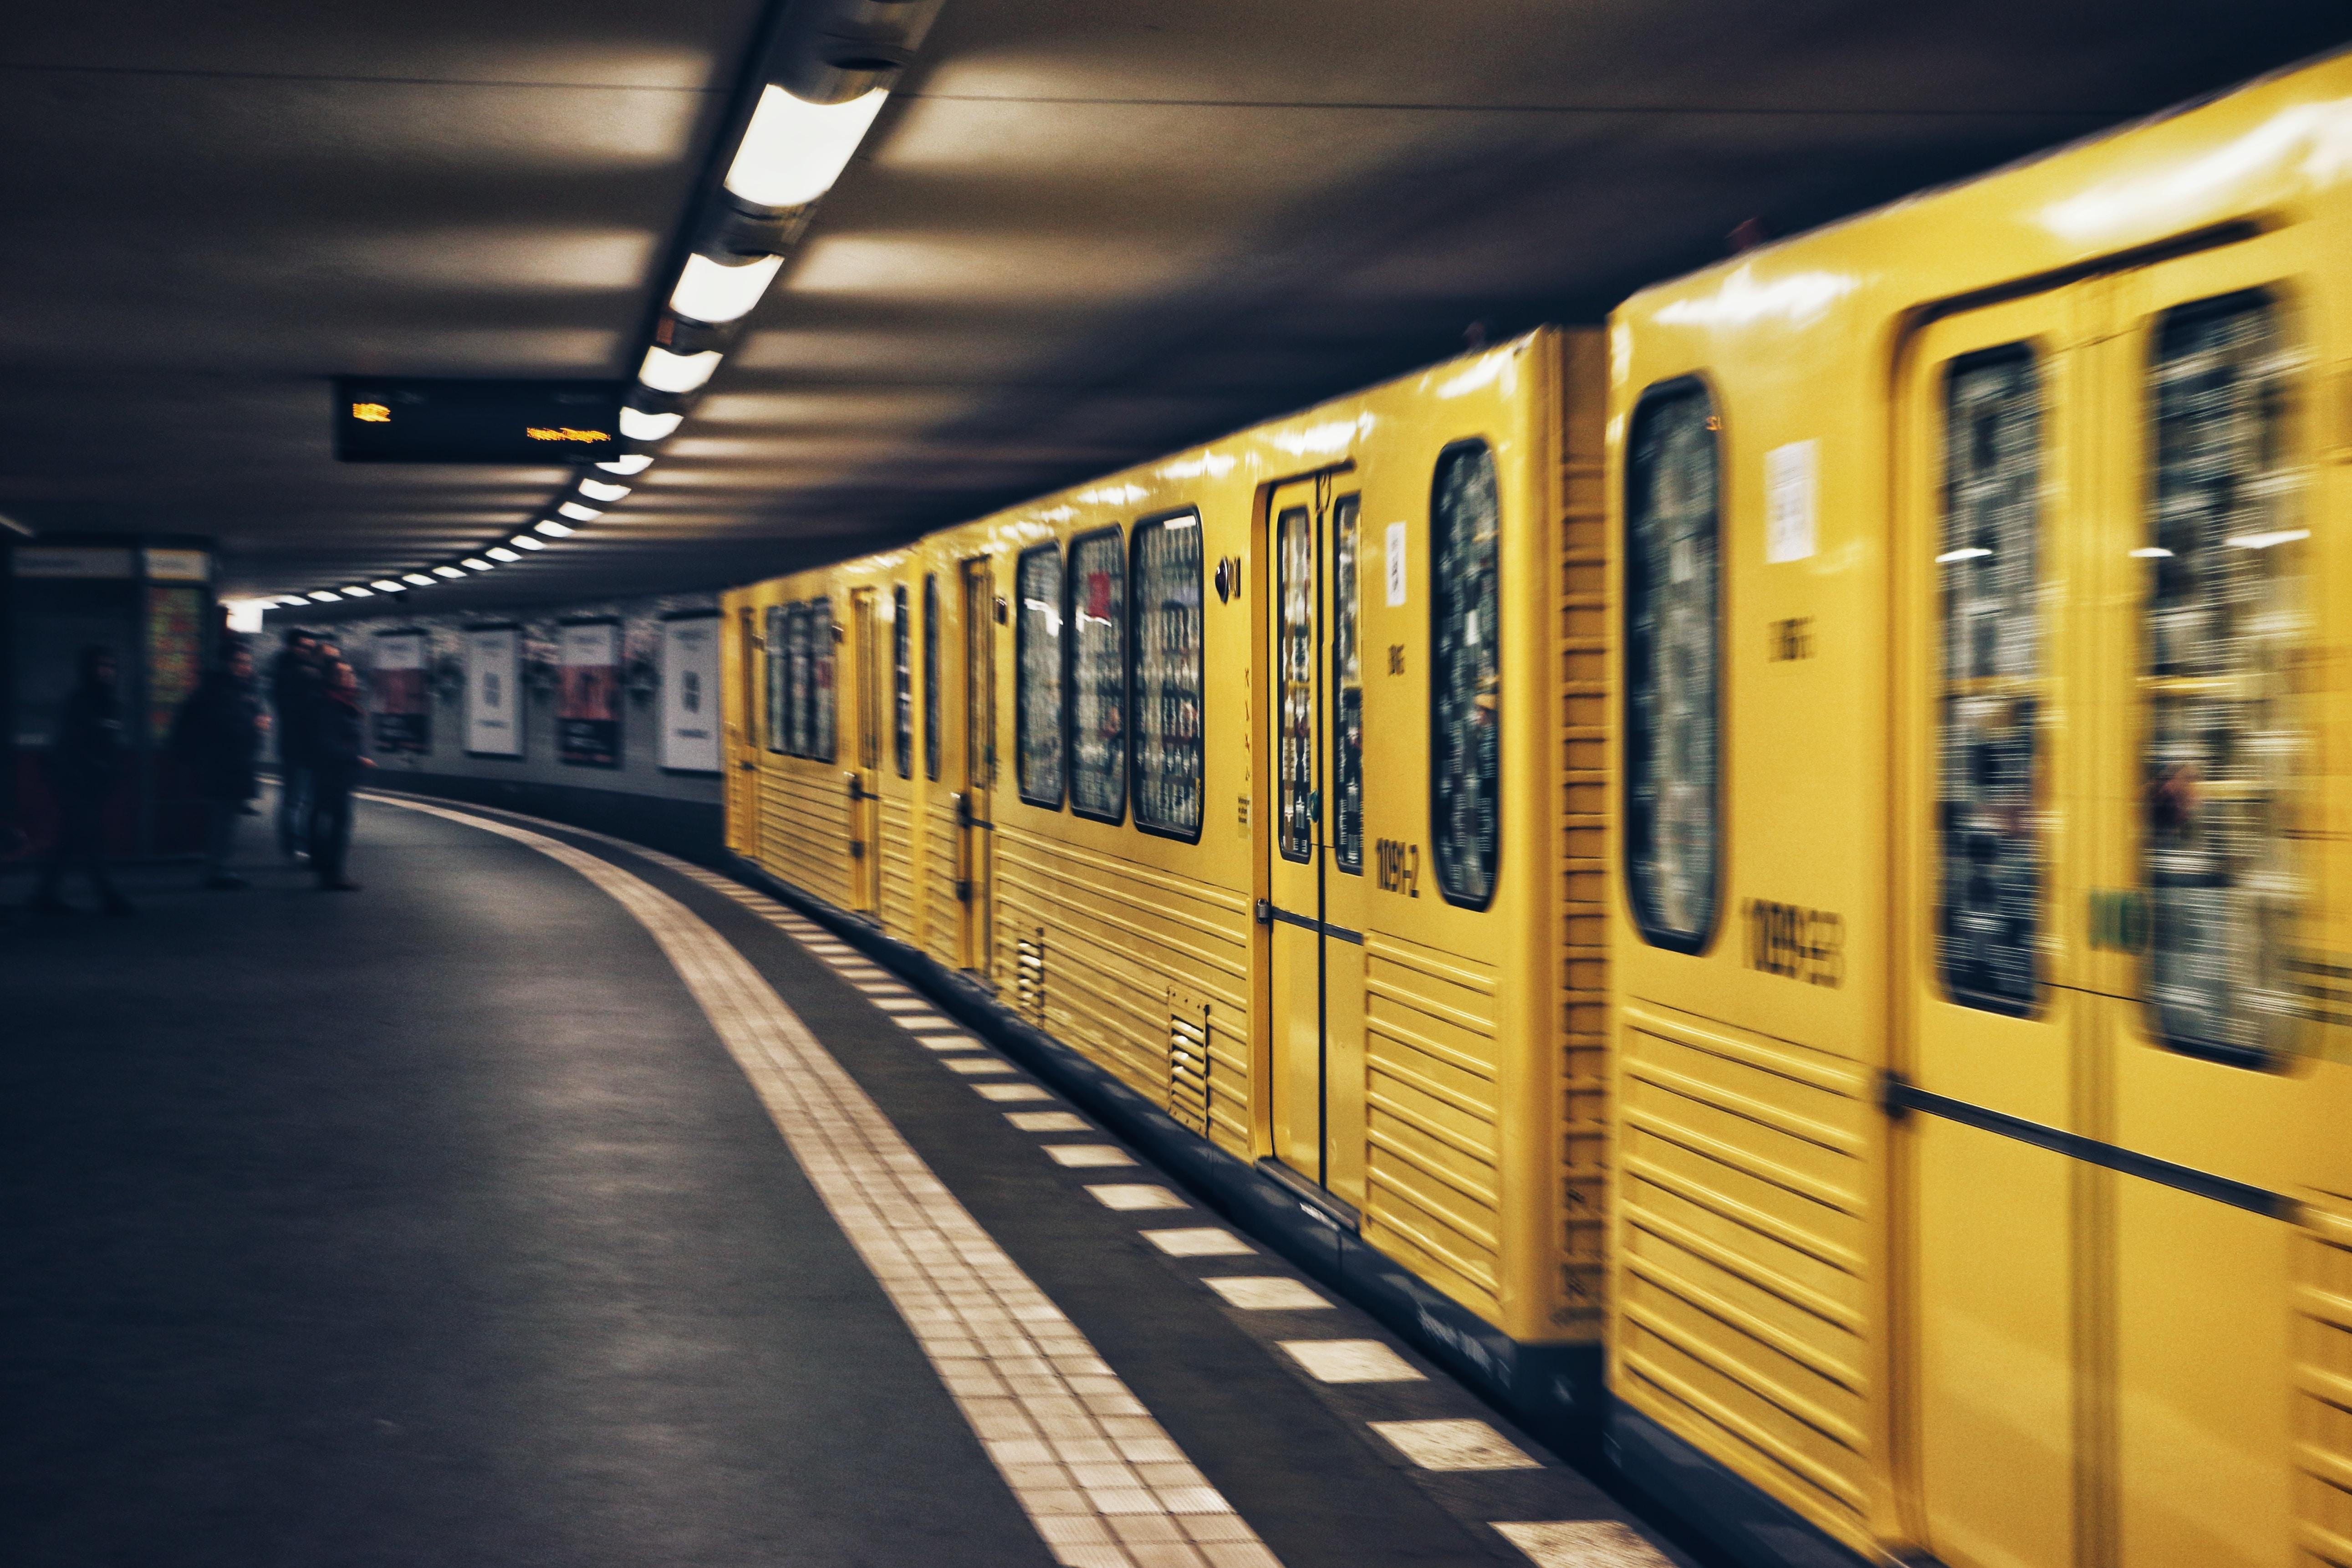 Yellow train cars speed past the platform